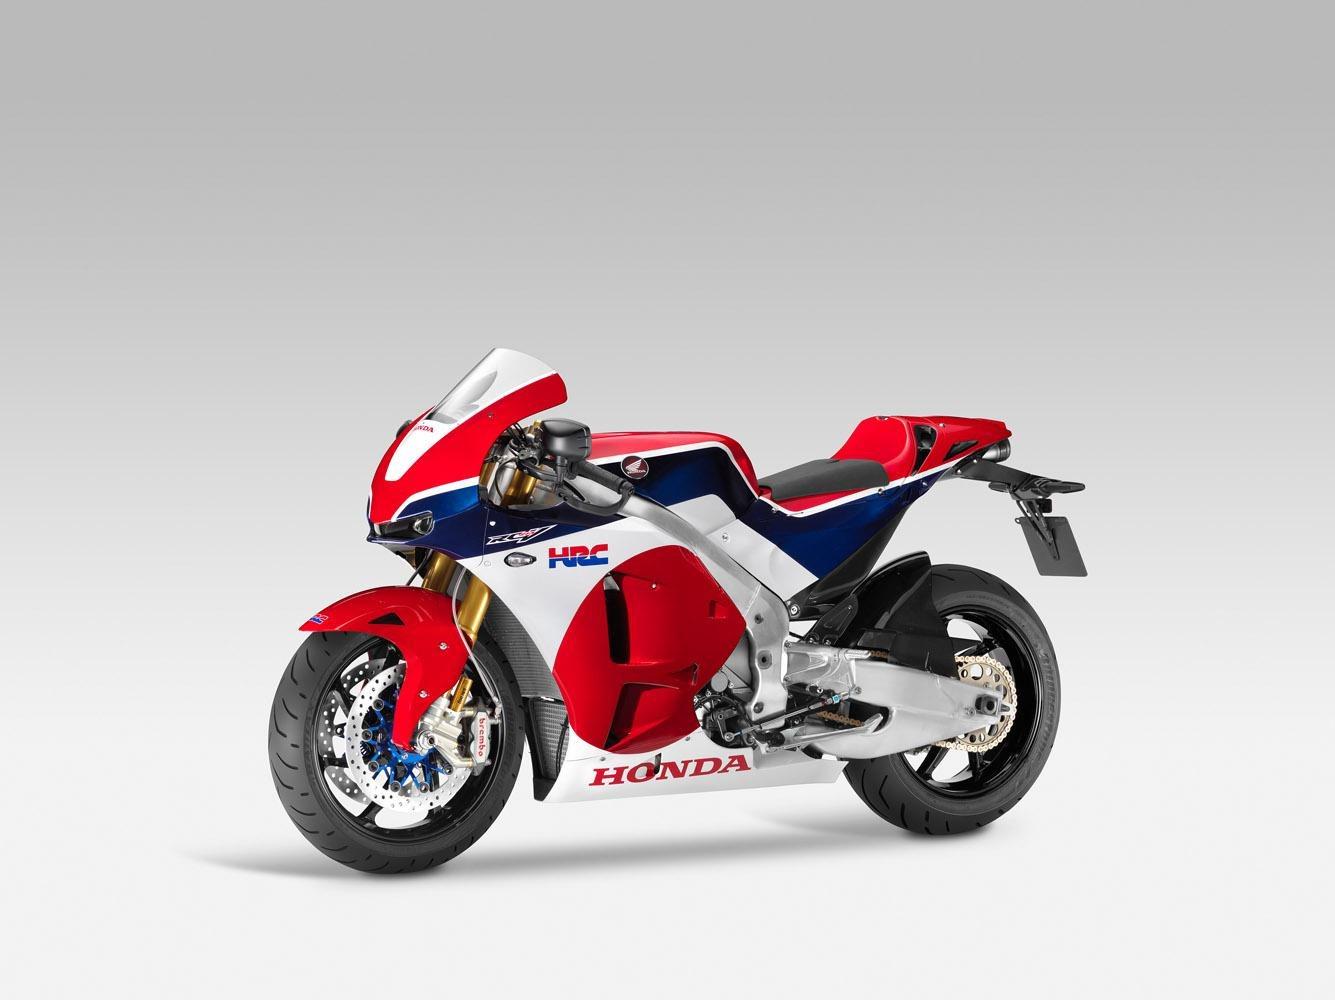 Honda RC213V-S - Informationen und bilder - Modellnews